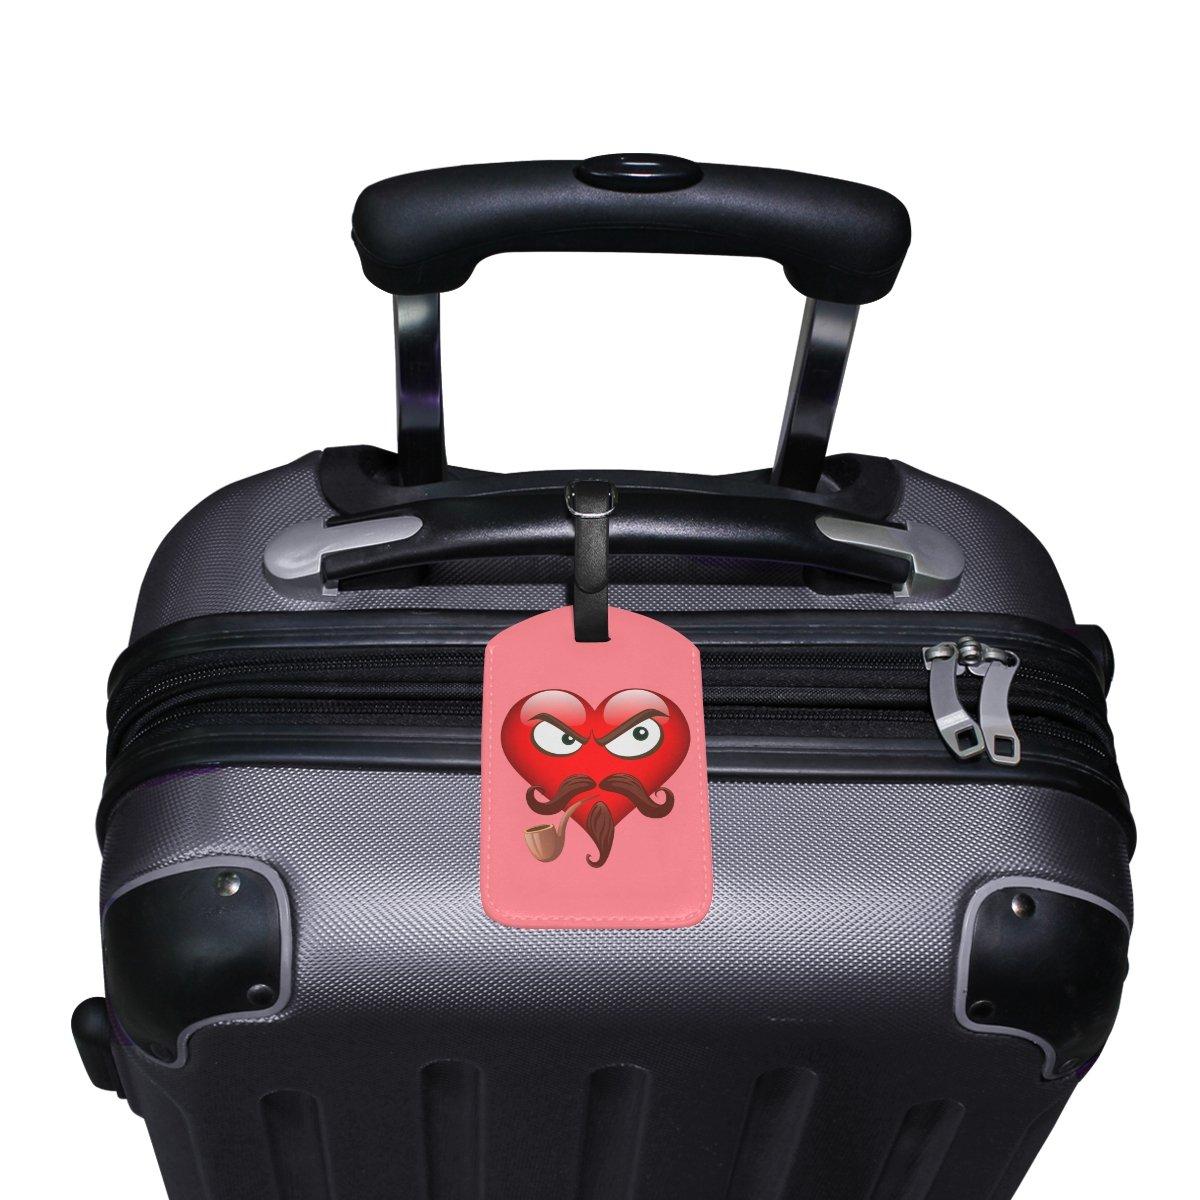 Saobao Travel Luggage Tag Tobacco Pipe Emoji PU Leather Baggage Suitcase Travel ID Bag Tag 1Pcs